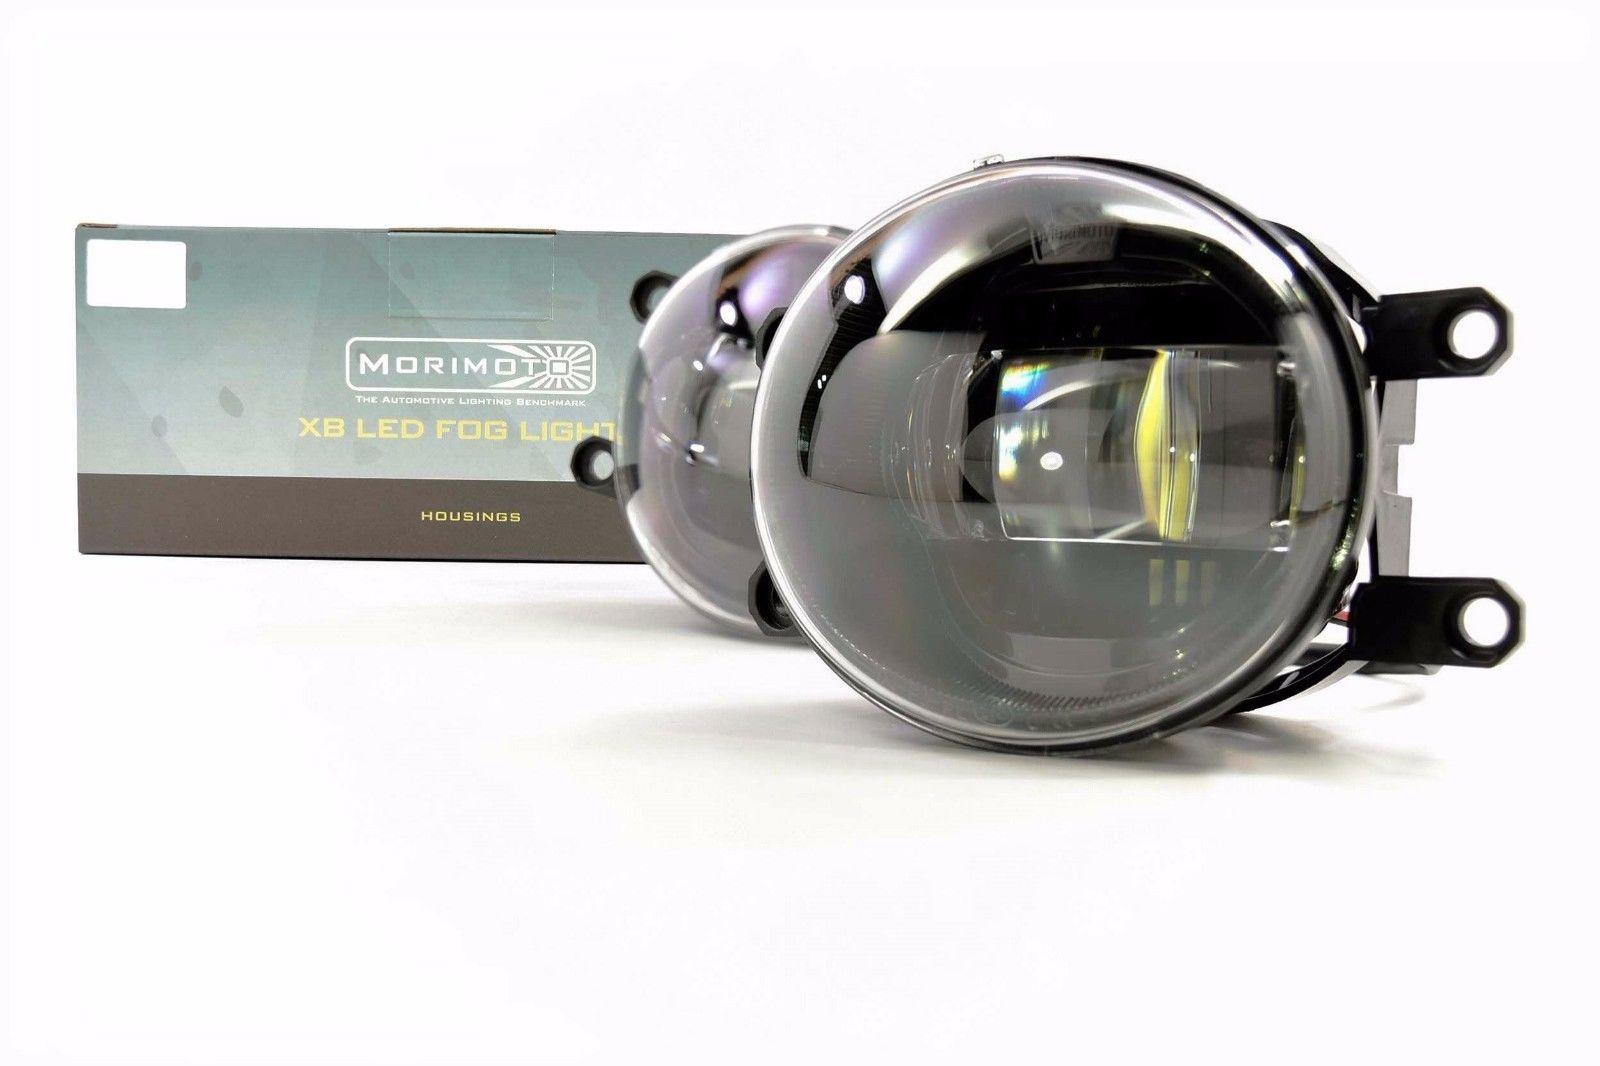 2010 Toyota Tacoma Fog Lights Light Wiring Diagram Morimoto Led For Ebay 1600x1066